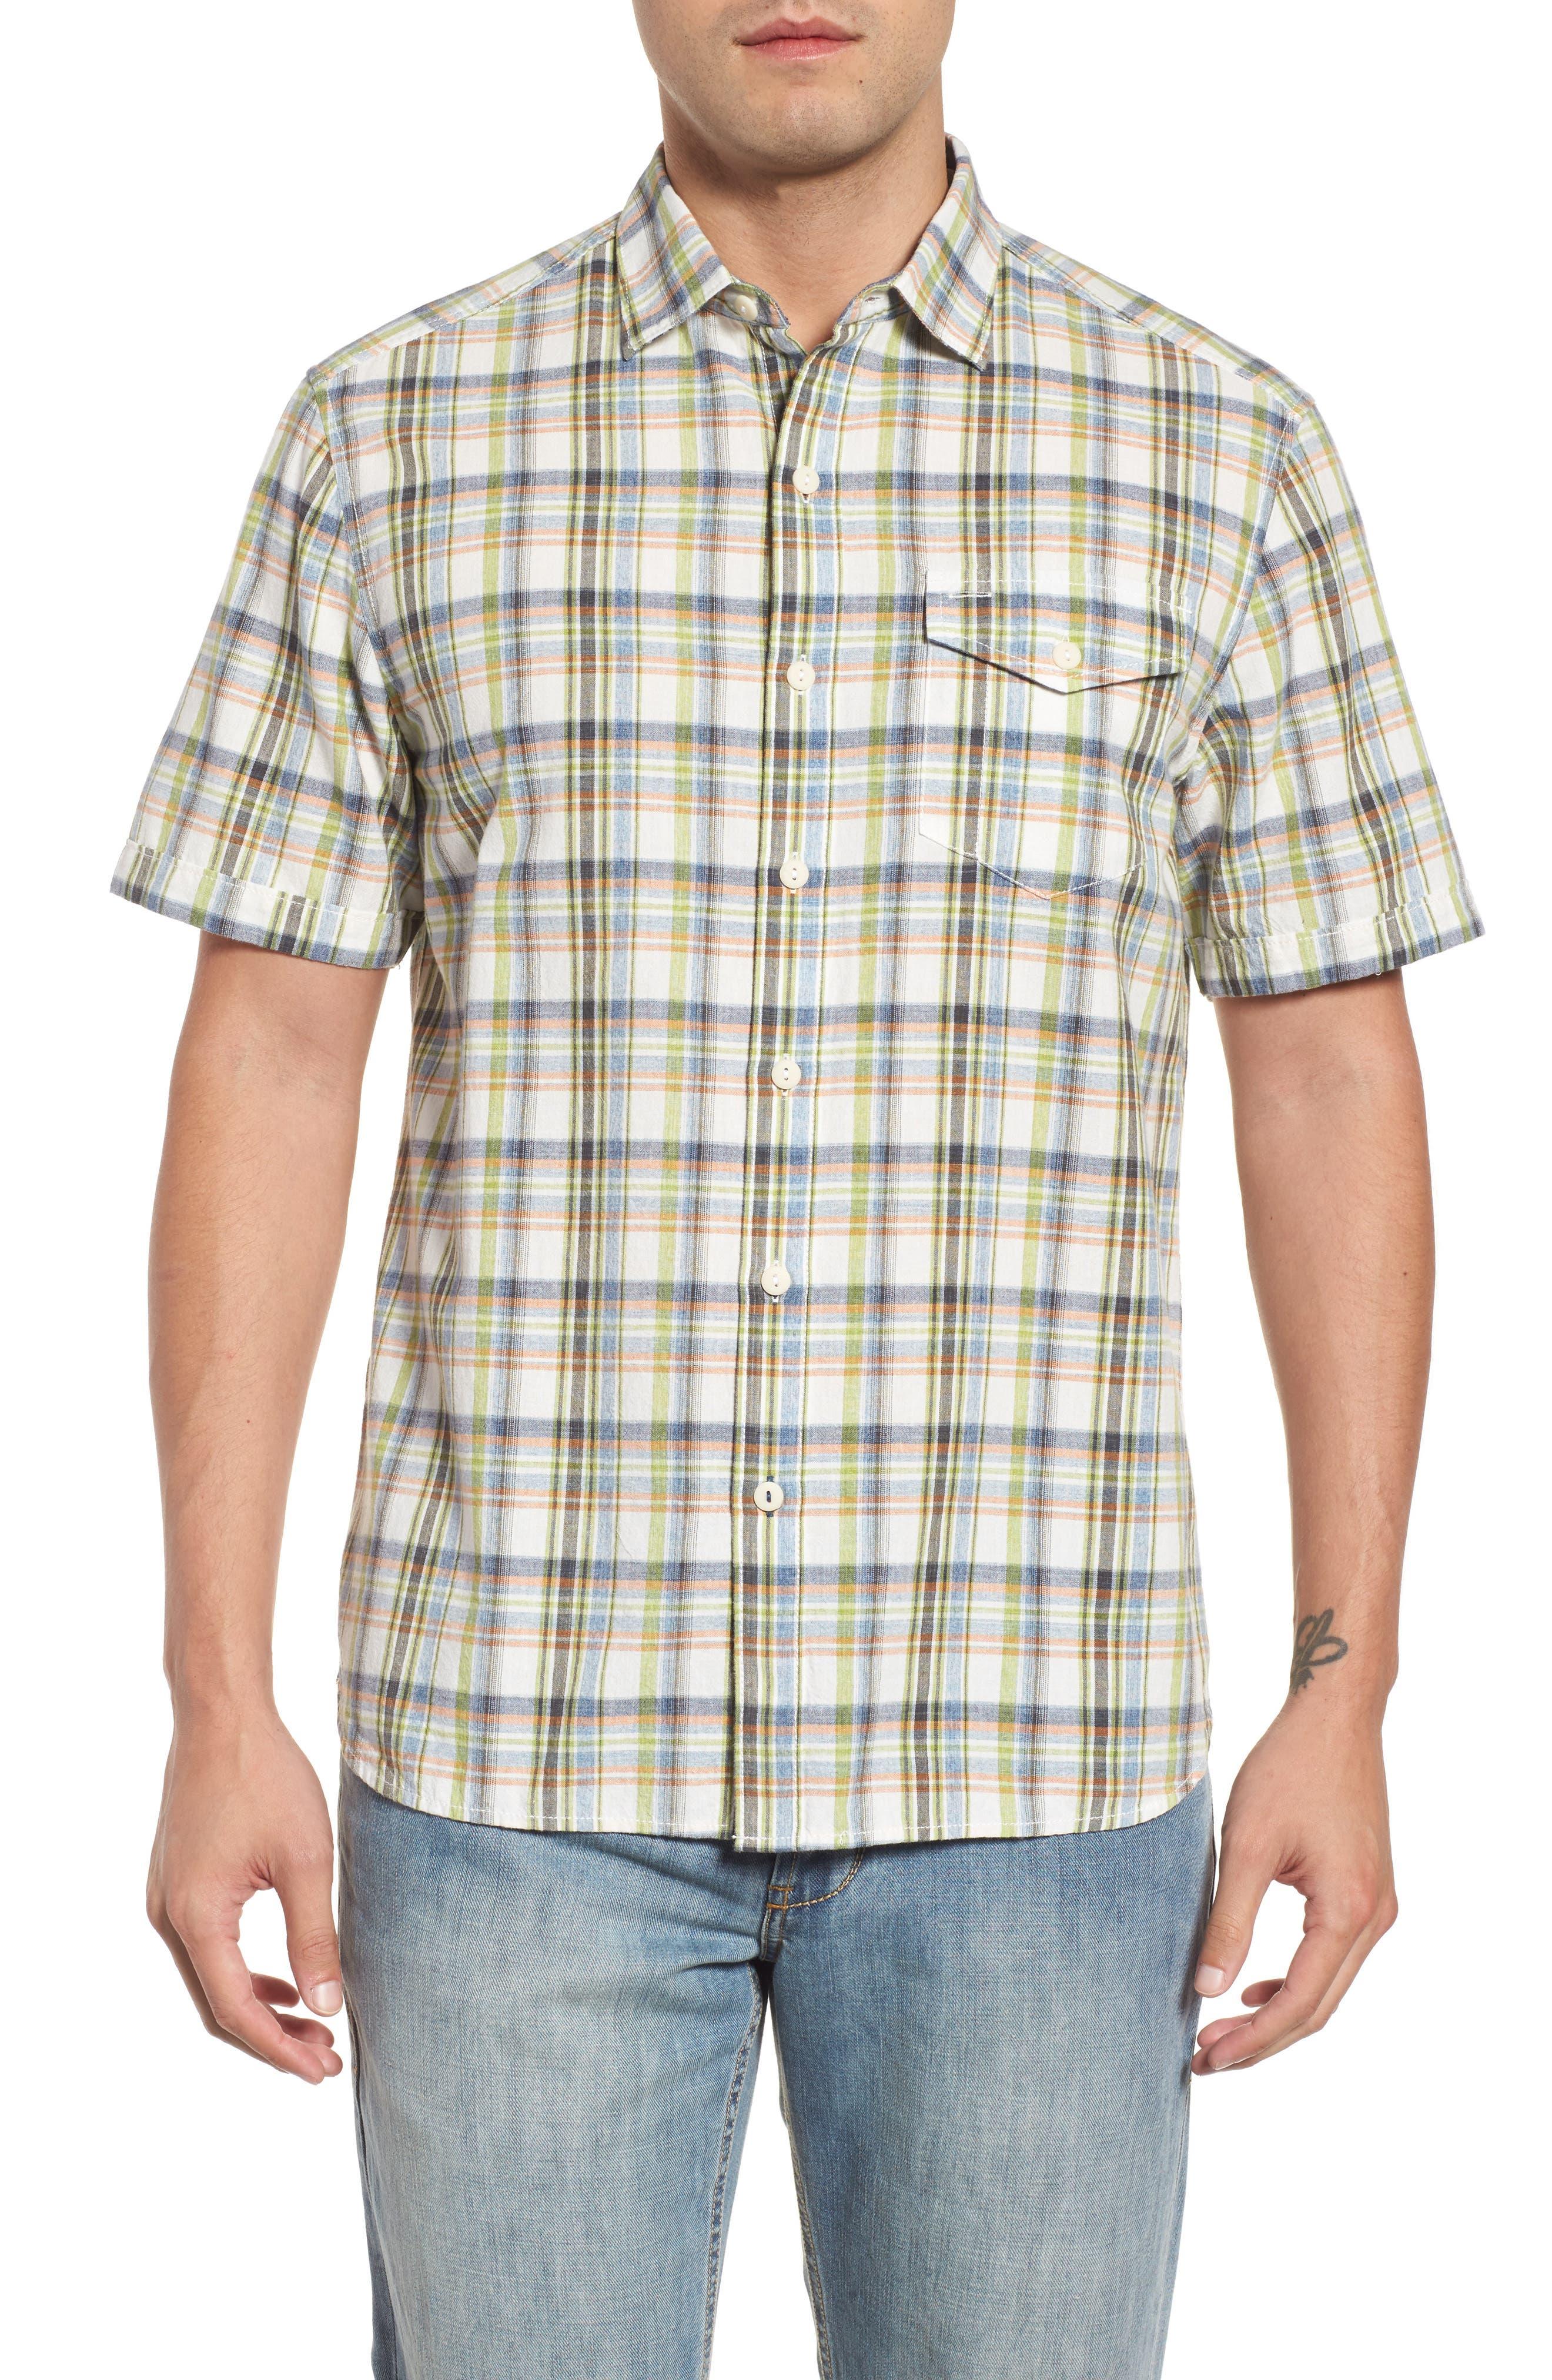 Ocean Cay Plaid Sport Shirt,                         Main,                         color, 300